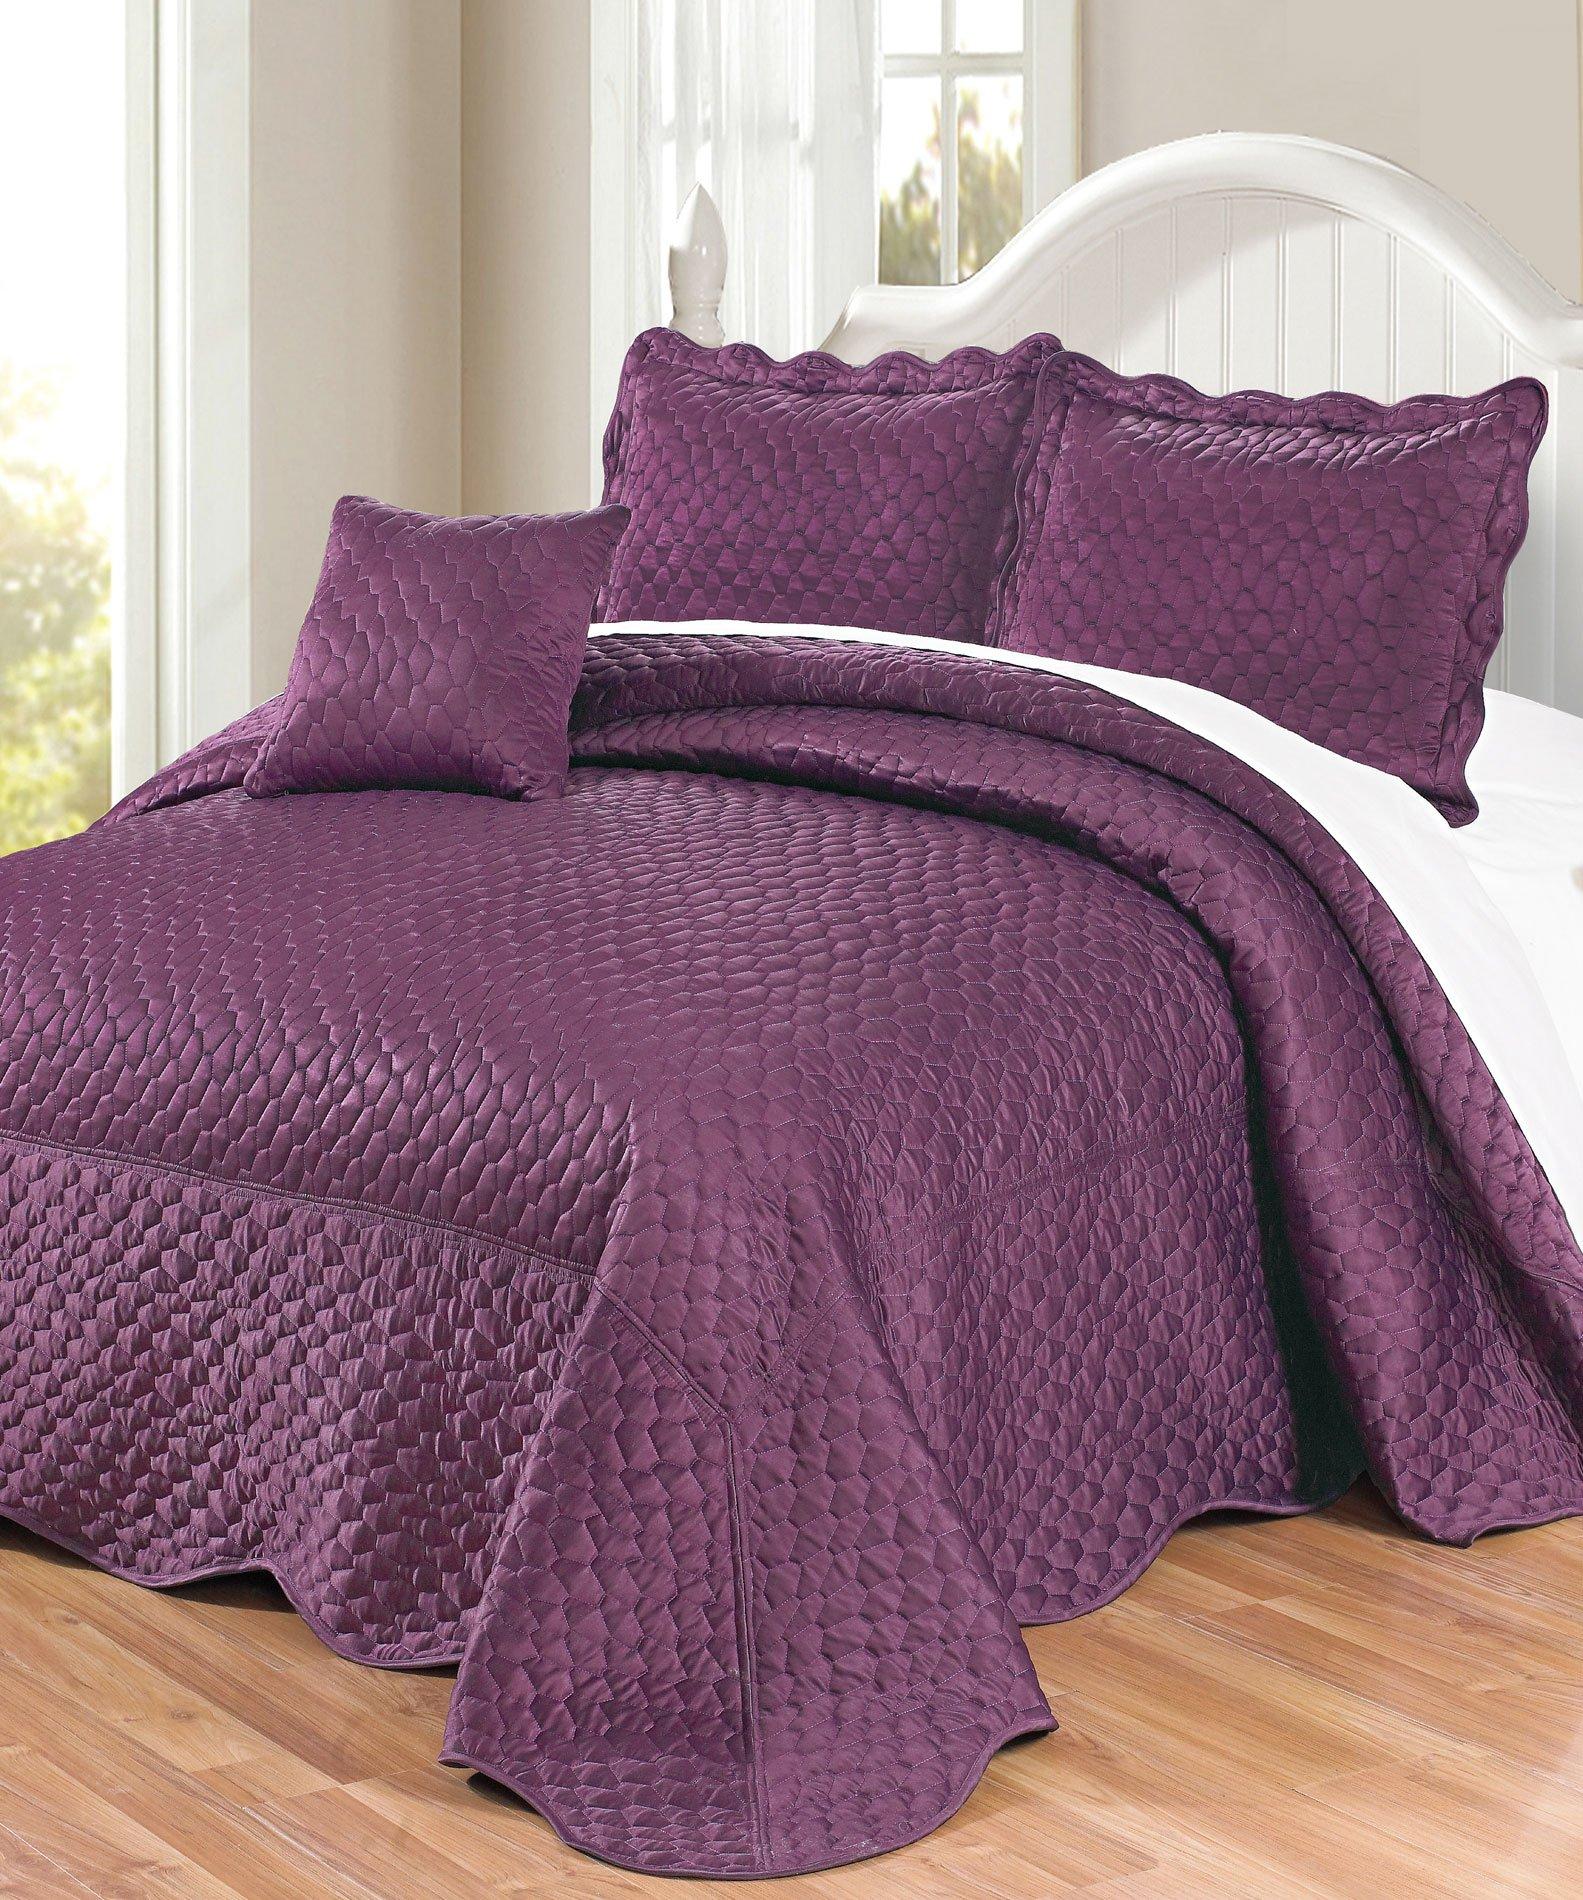 Serenta Matte Satin 4 Piece Bedspread Set, King, Prune Purple